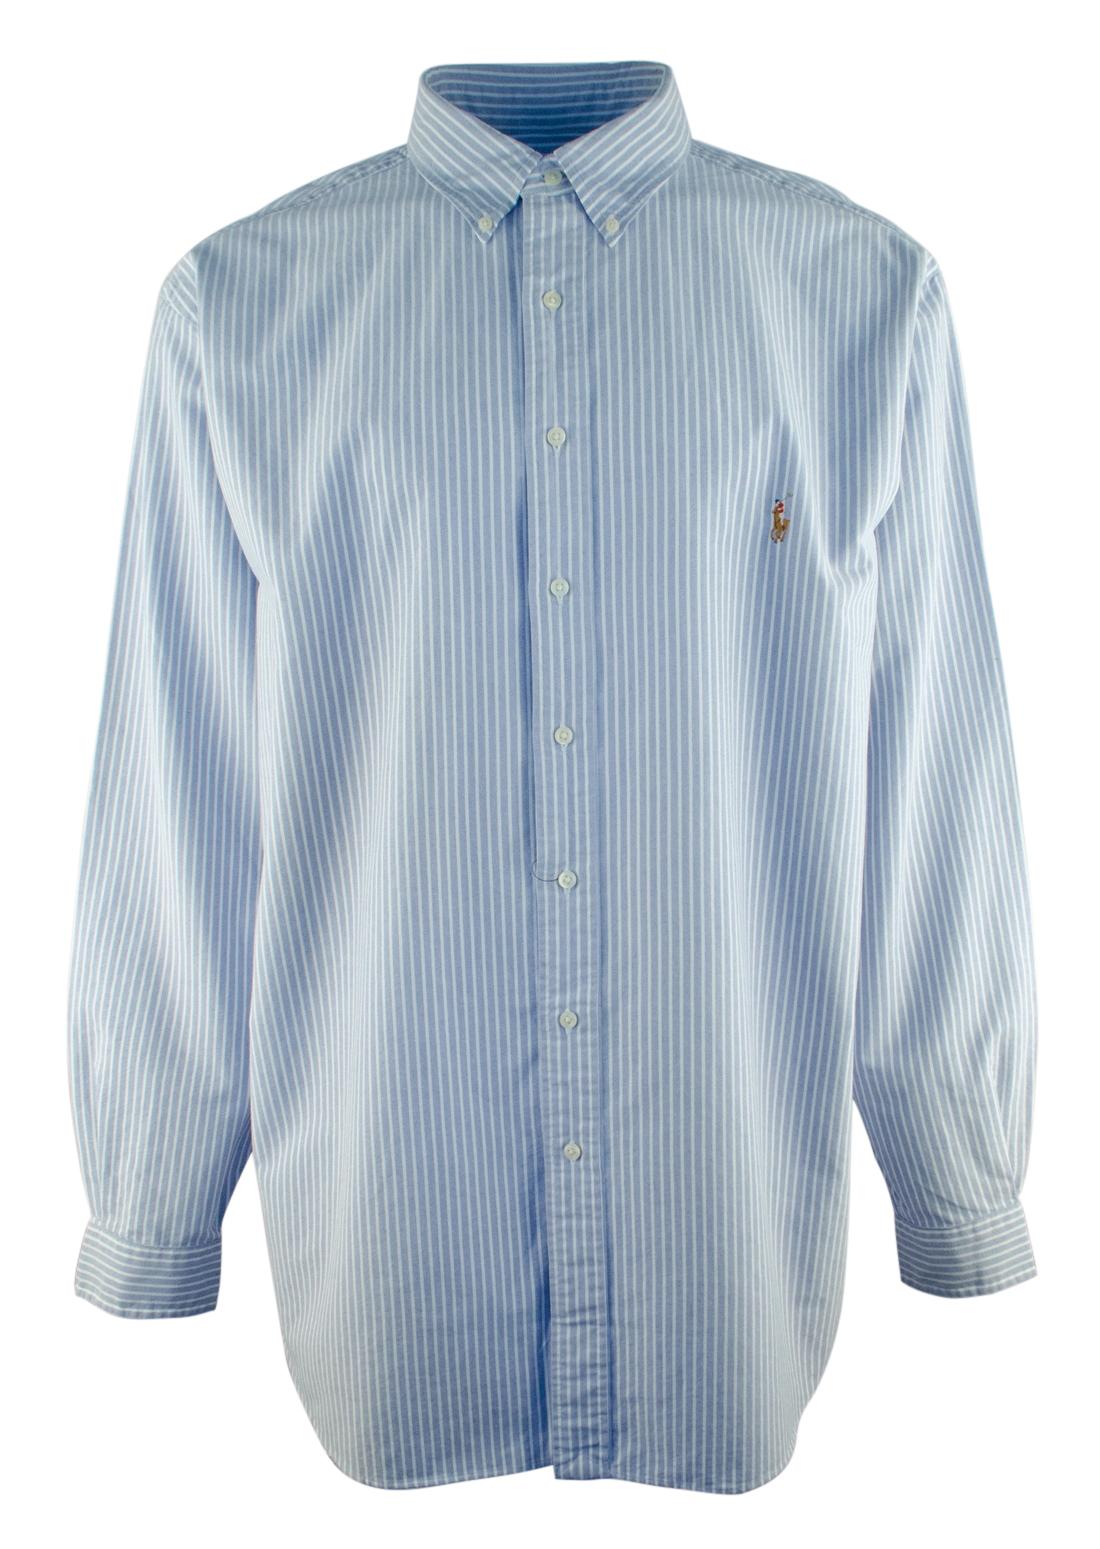 ralph lauren men 39 s big and tall long sleeve striped oxford